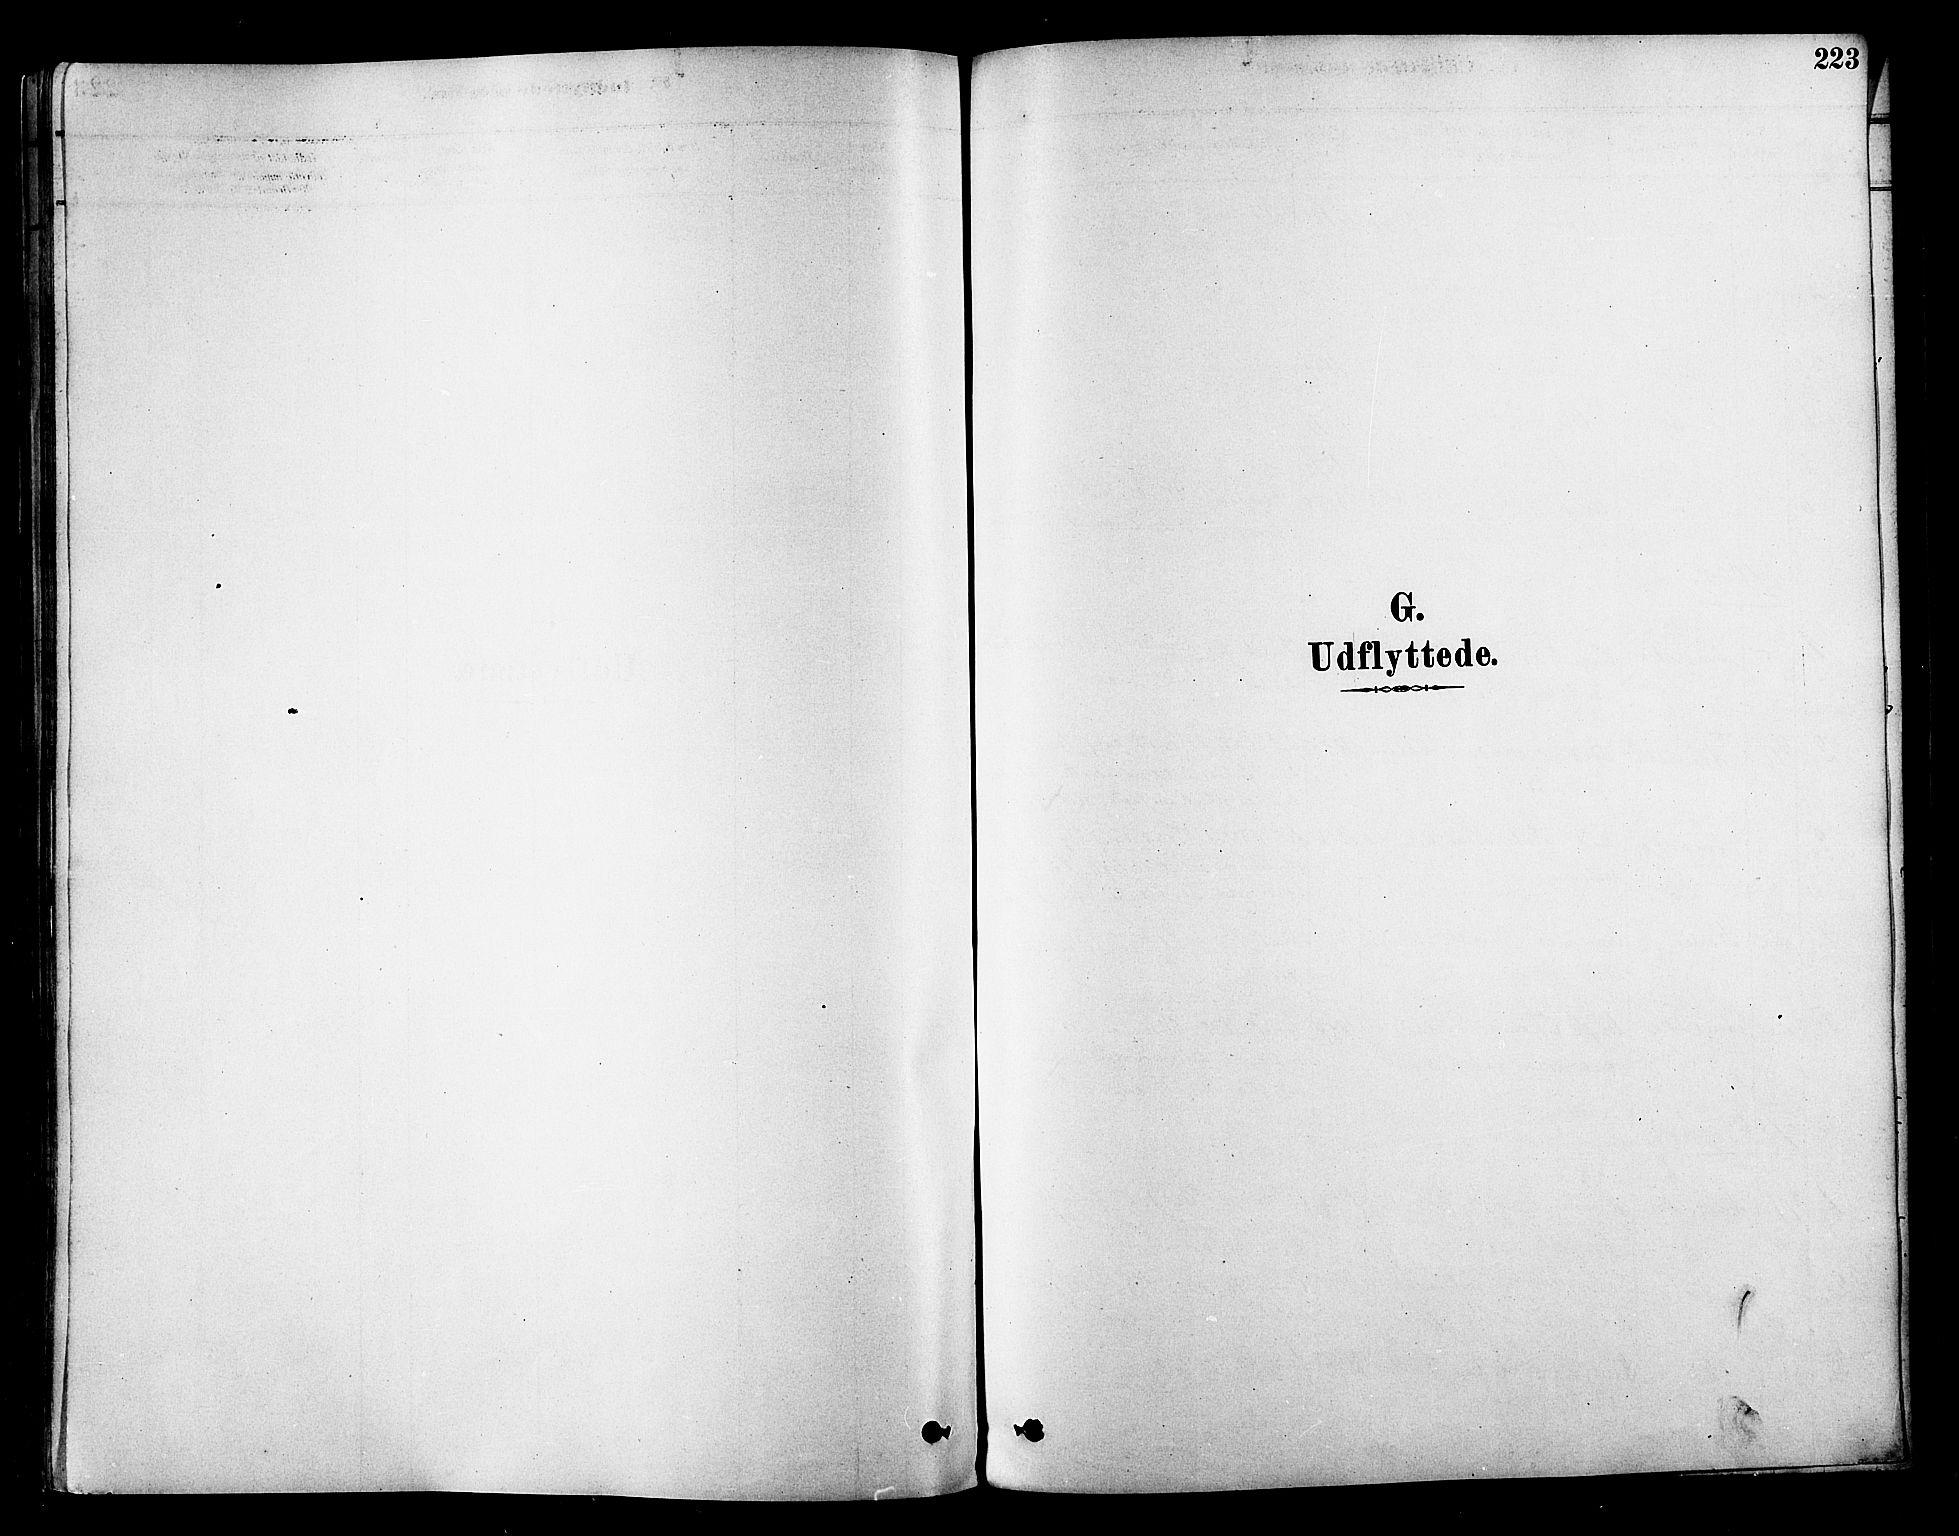 SATØ, Skjervøy sokneprestkontor, H/Ha/Haa/L0009kirke: Ministerialbok nr. 9, 1878-1887, s. 223